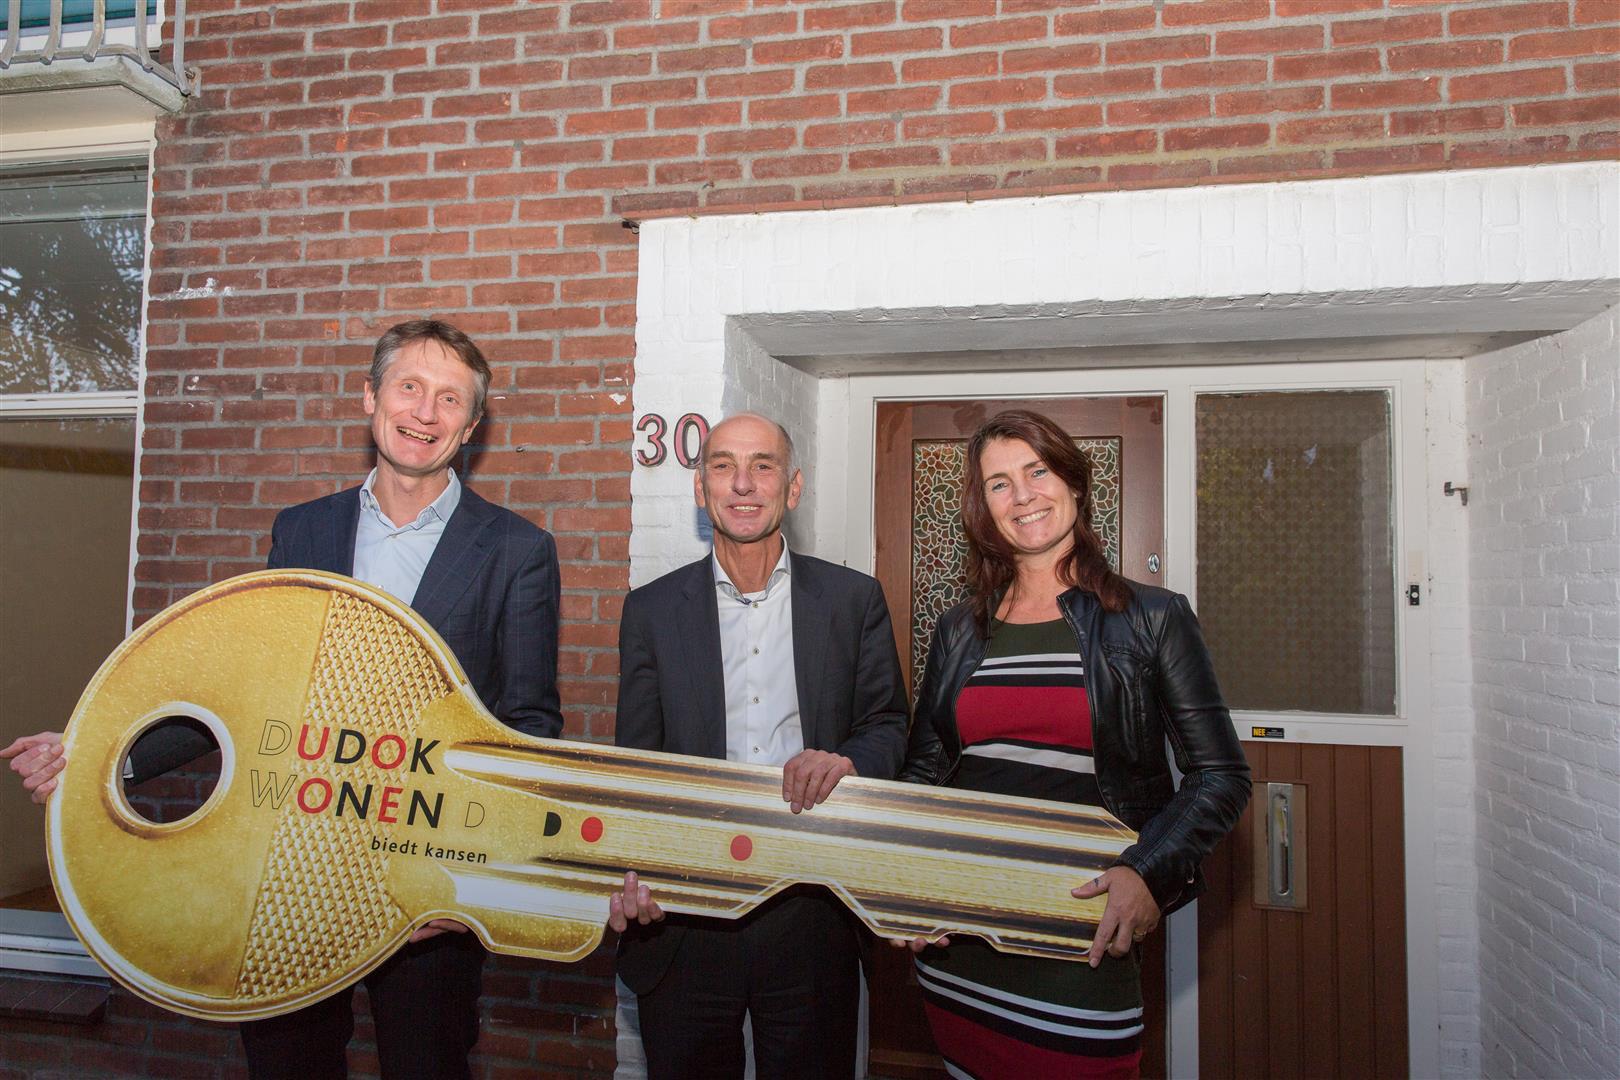 Harro Zanting (Dudok Wonen), Henri Gritter (Youké) en Sonja Hartkamp (RIBW) (Foto: Yvonne Hoefman)